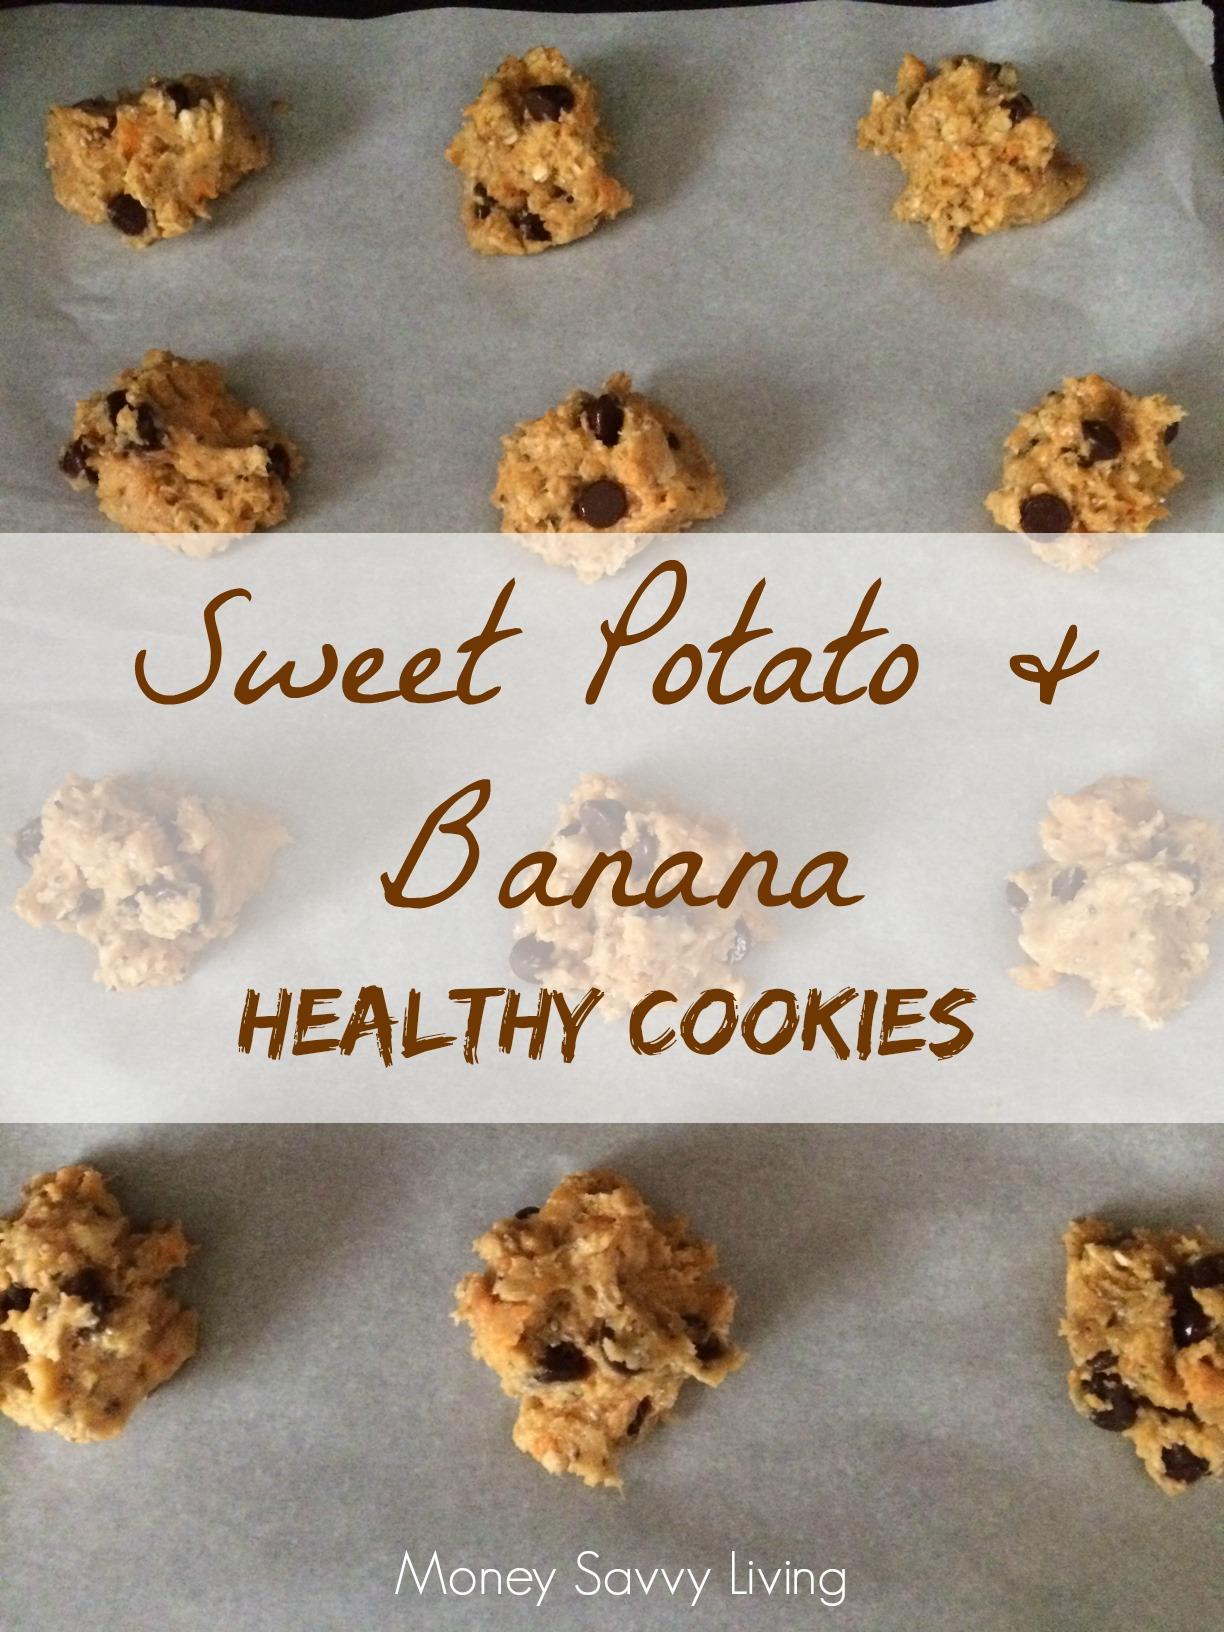 Sweet potato banana cookies | Money Savvy Living